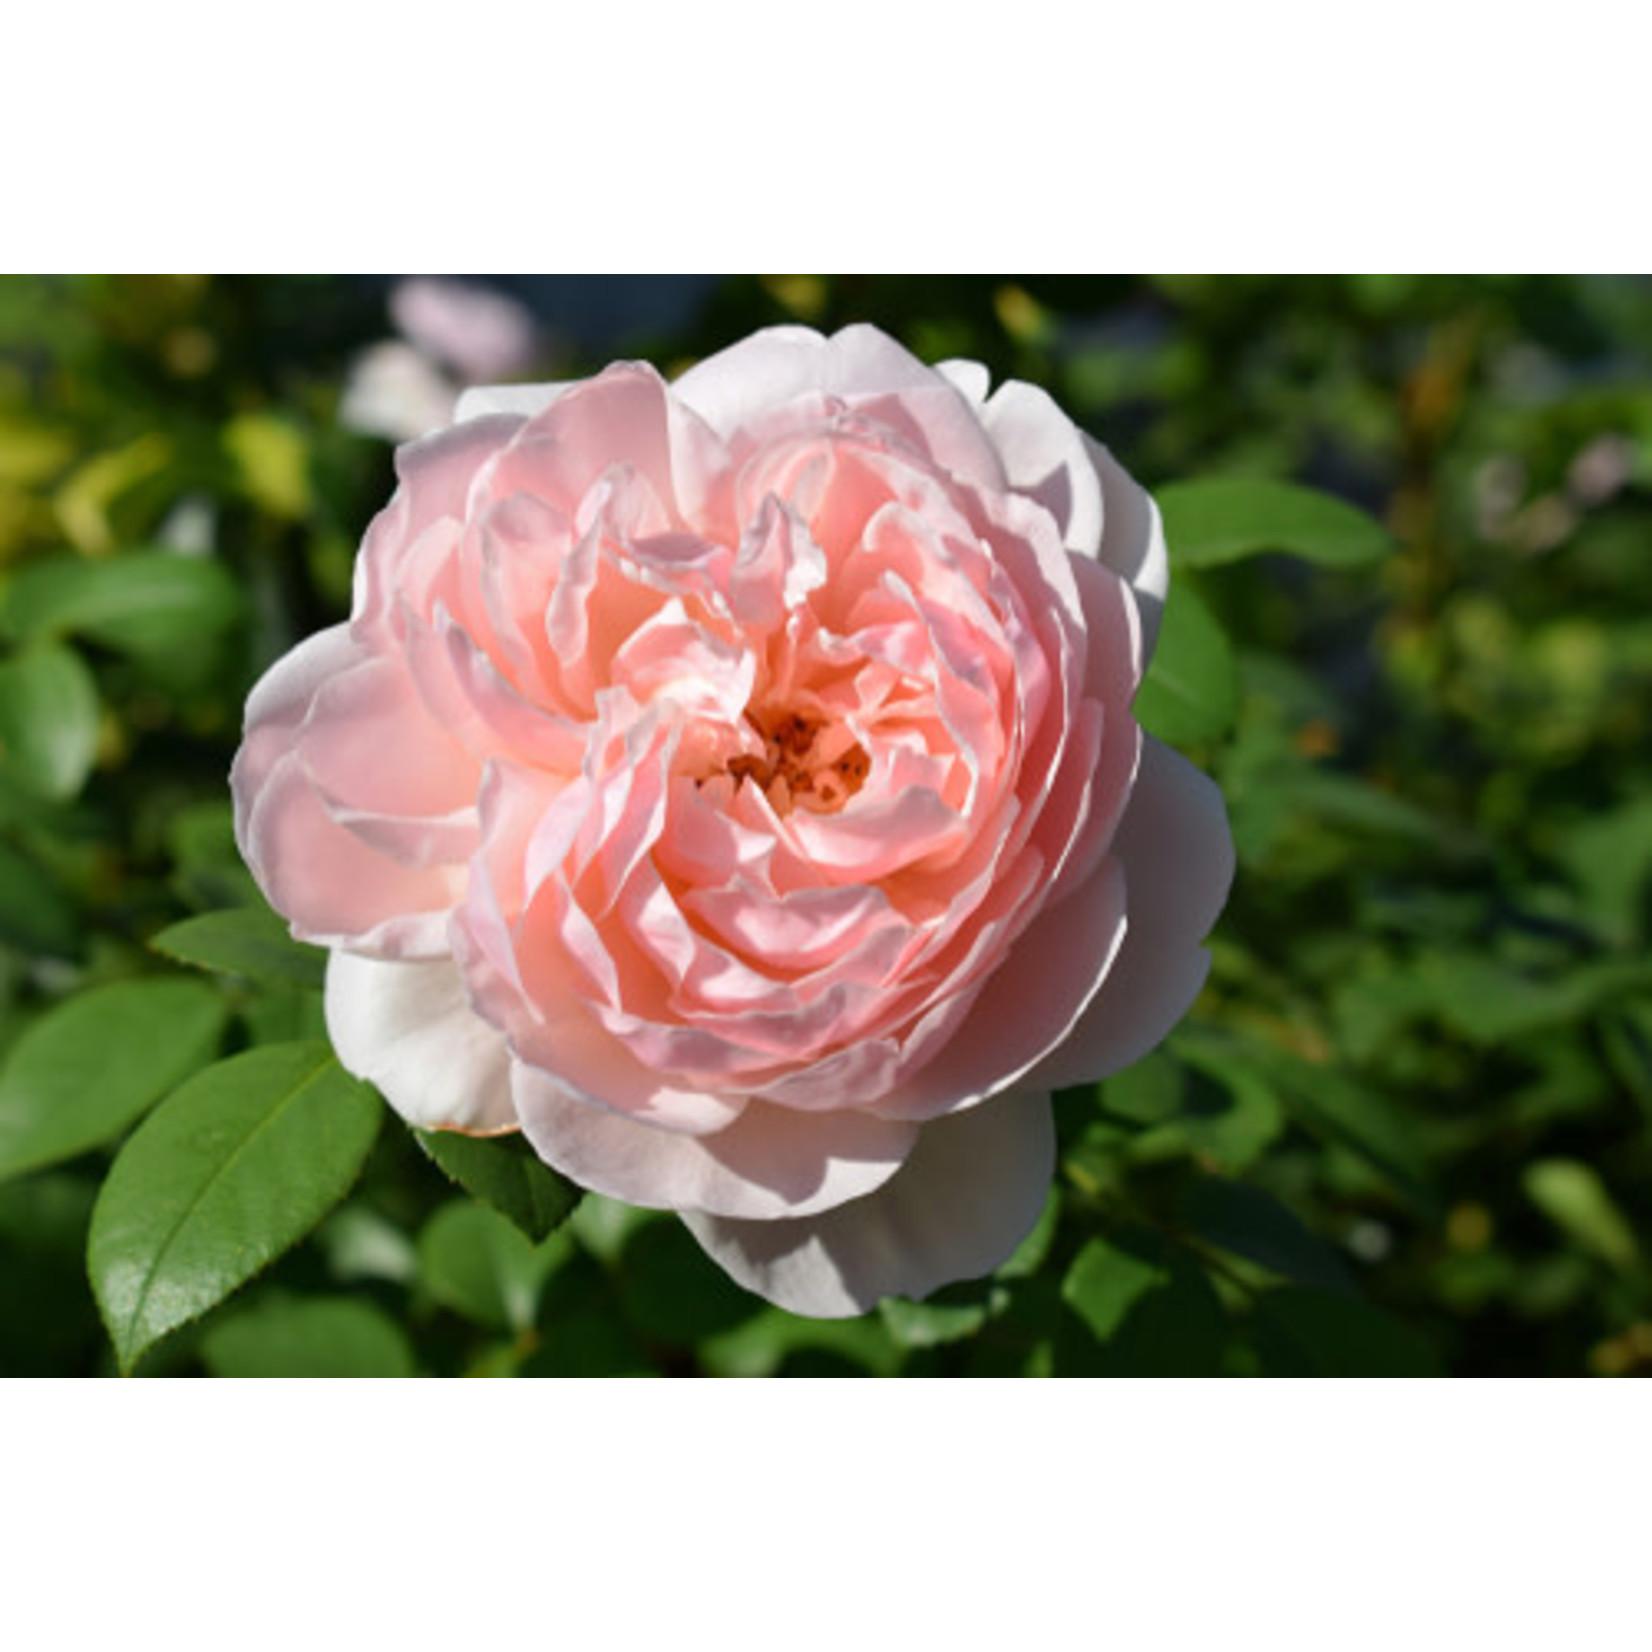 Rose 'Gentle Hermione Pink' - 3 gal